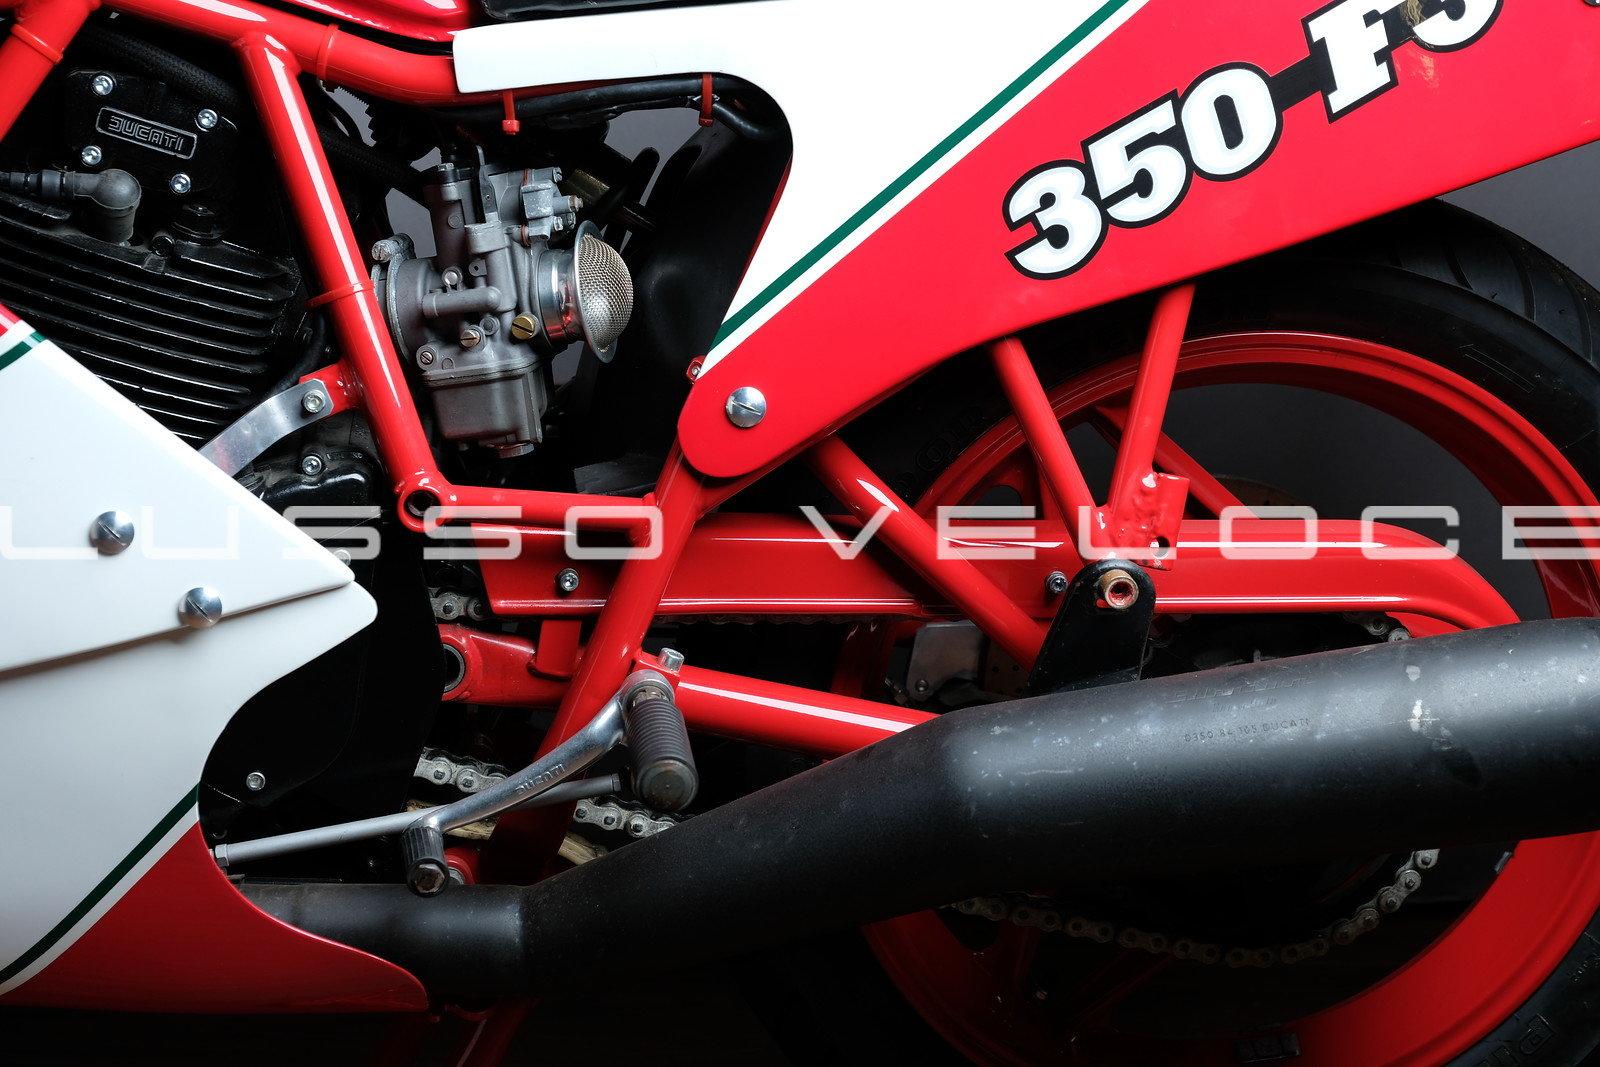 1986 Rare Ducati F3 350 fully restored For Sale (picture 14 of 15)